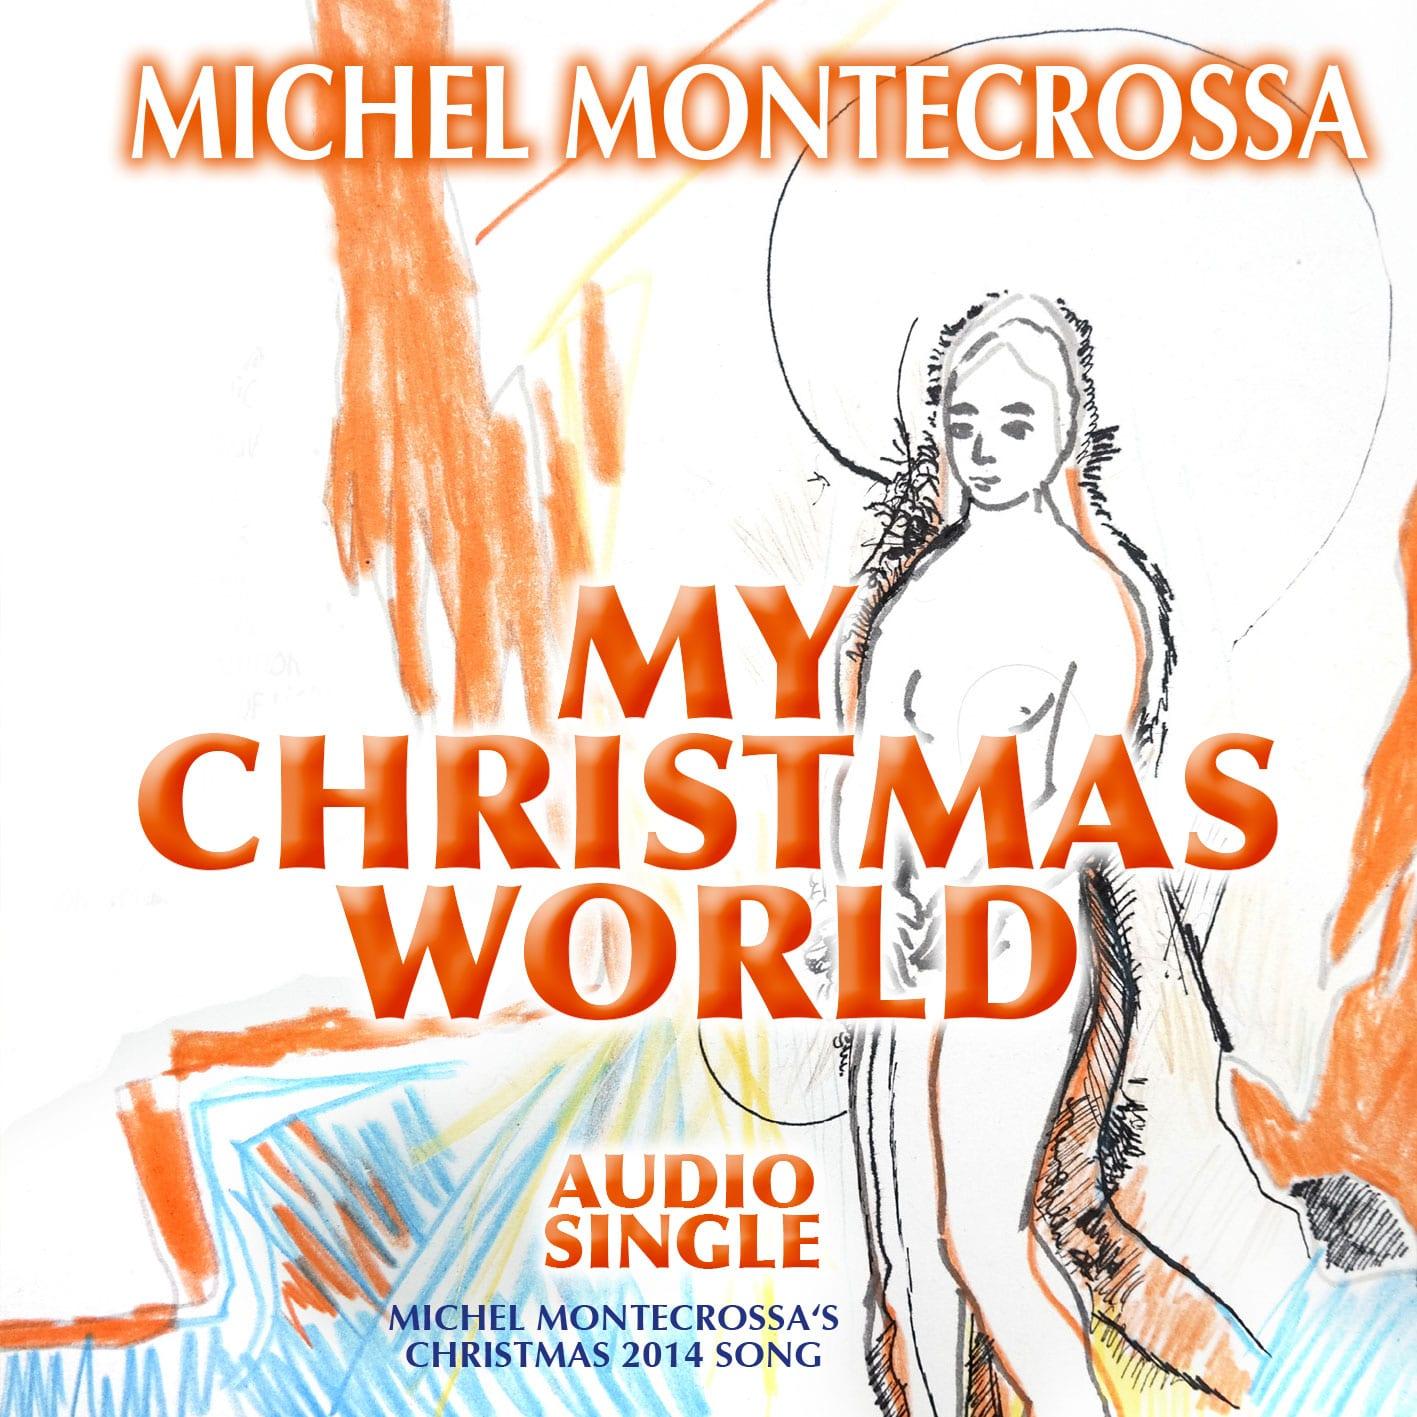 My Christmas World - Single